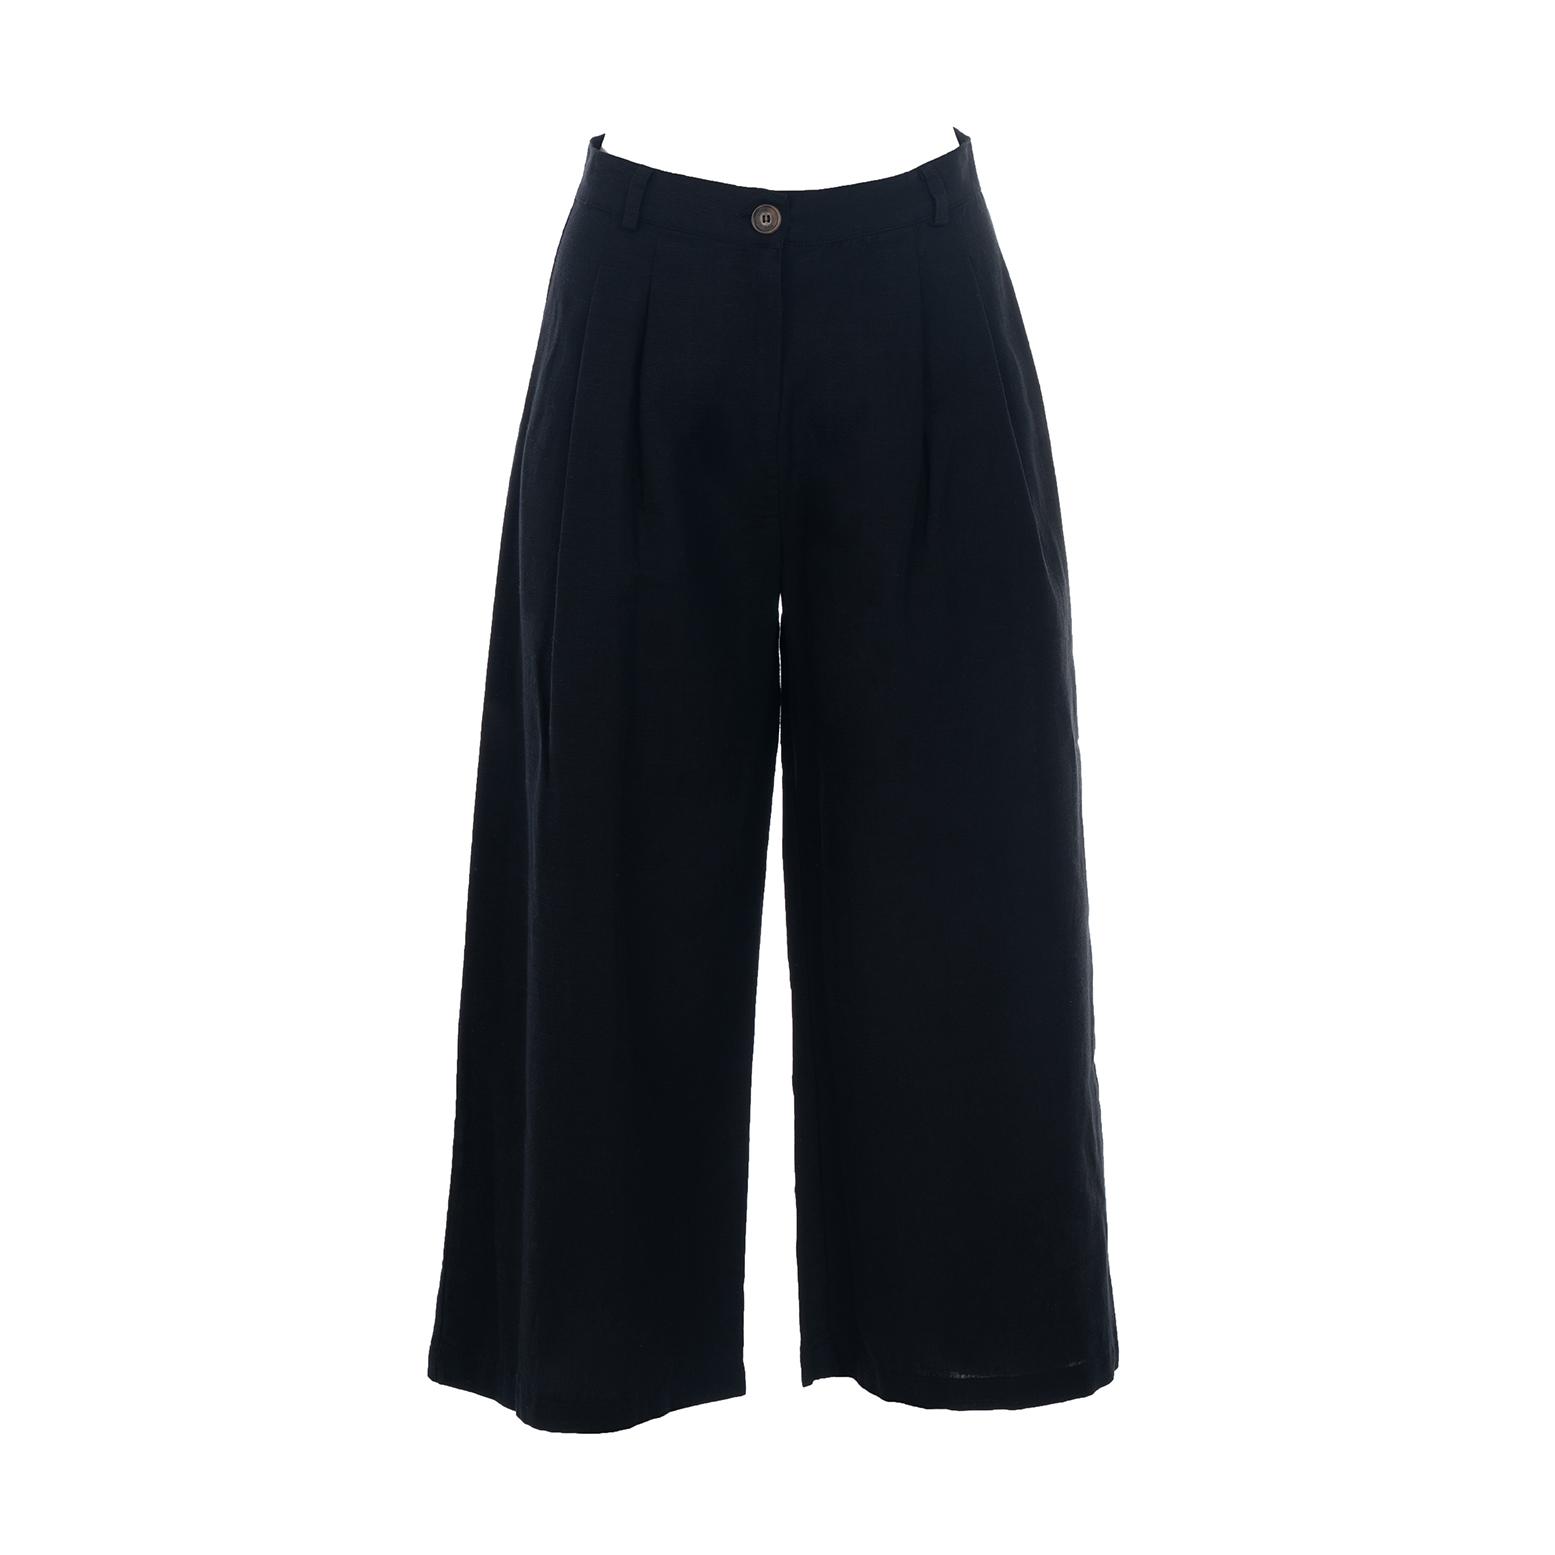 Linda Raff Collection -BEACH PANTS CORN BLACK LINEN